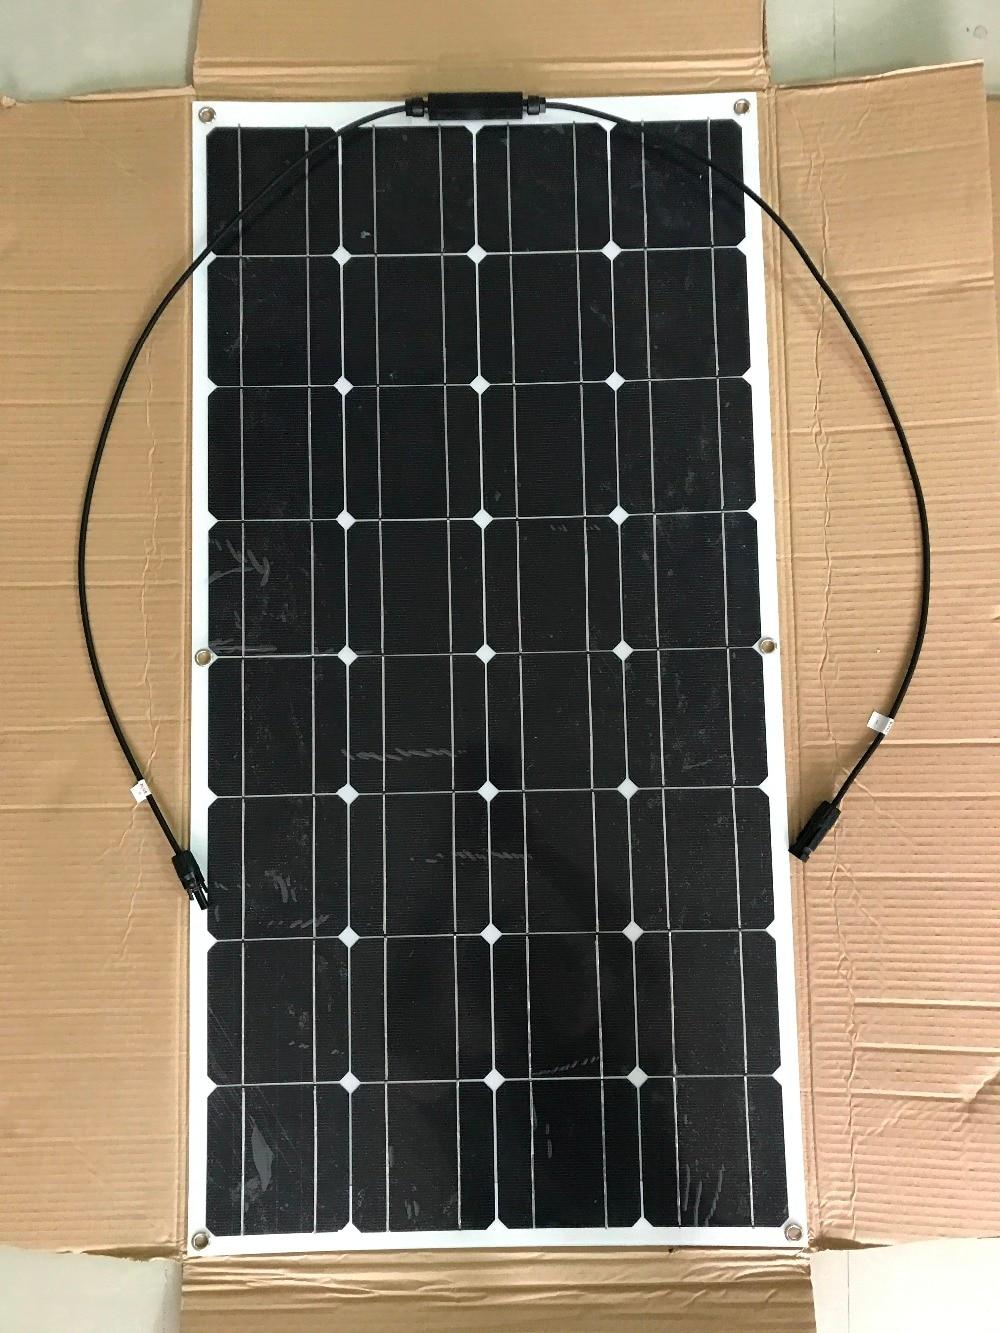 2017 latest 100w efficient solar panels flexible solar panels marine golf carts in solar. Black Bedroom Furniture Sets. Home Design Ideas